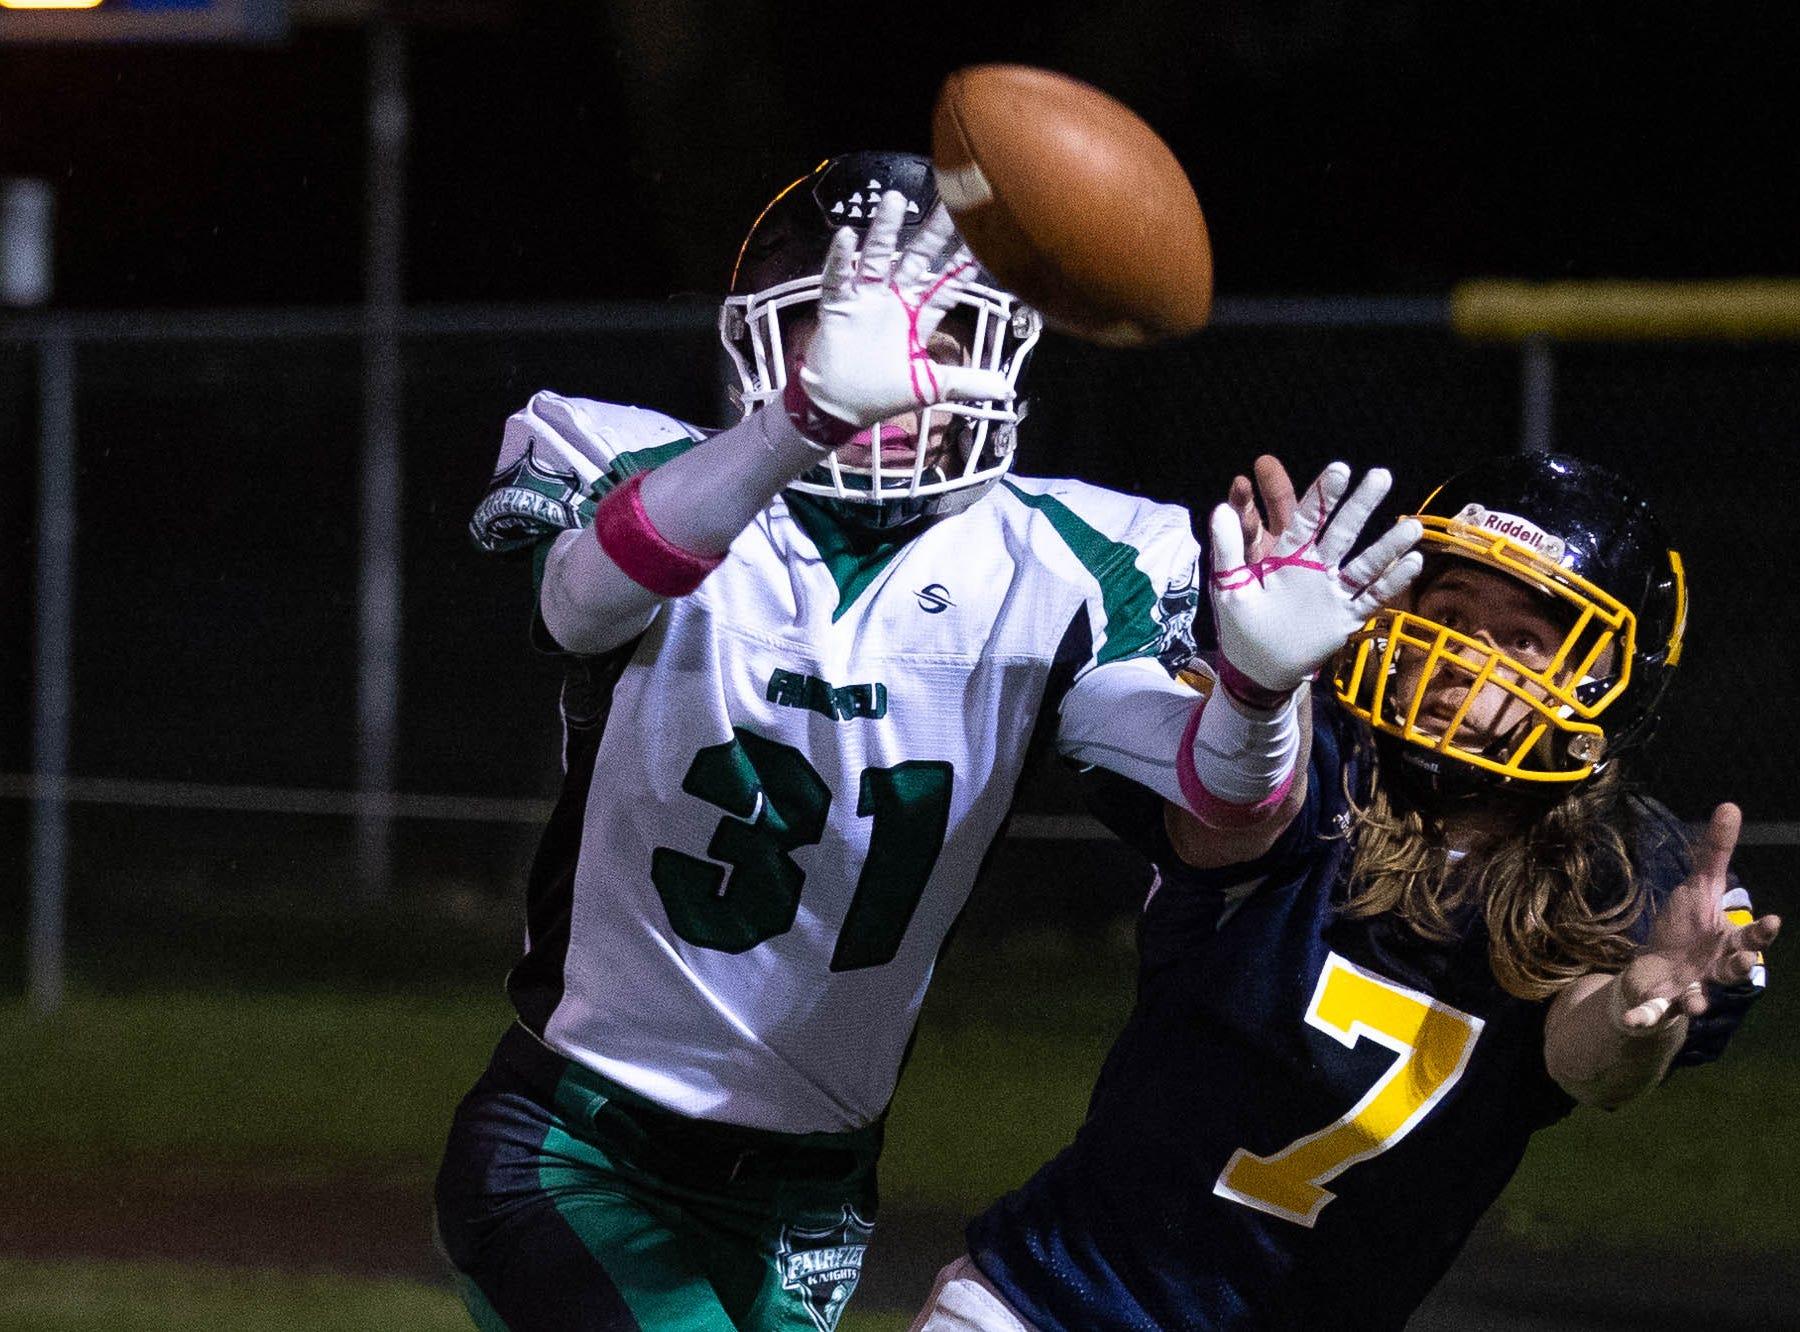 Live high school football updates: First round of District 3 playoffs on Nov. 2